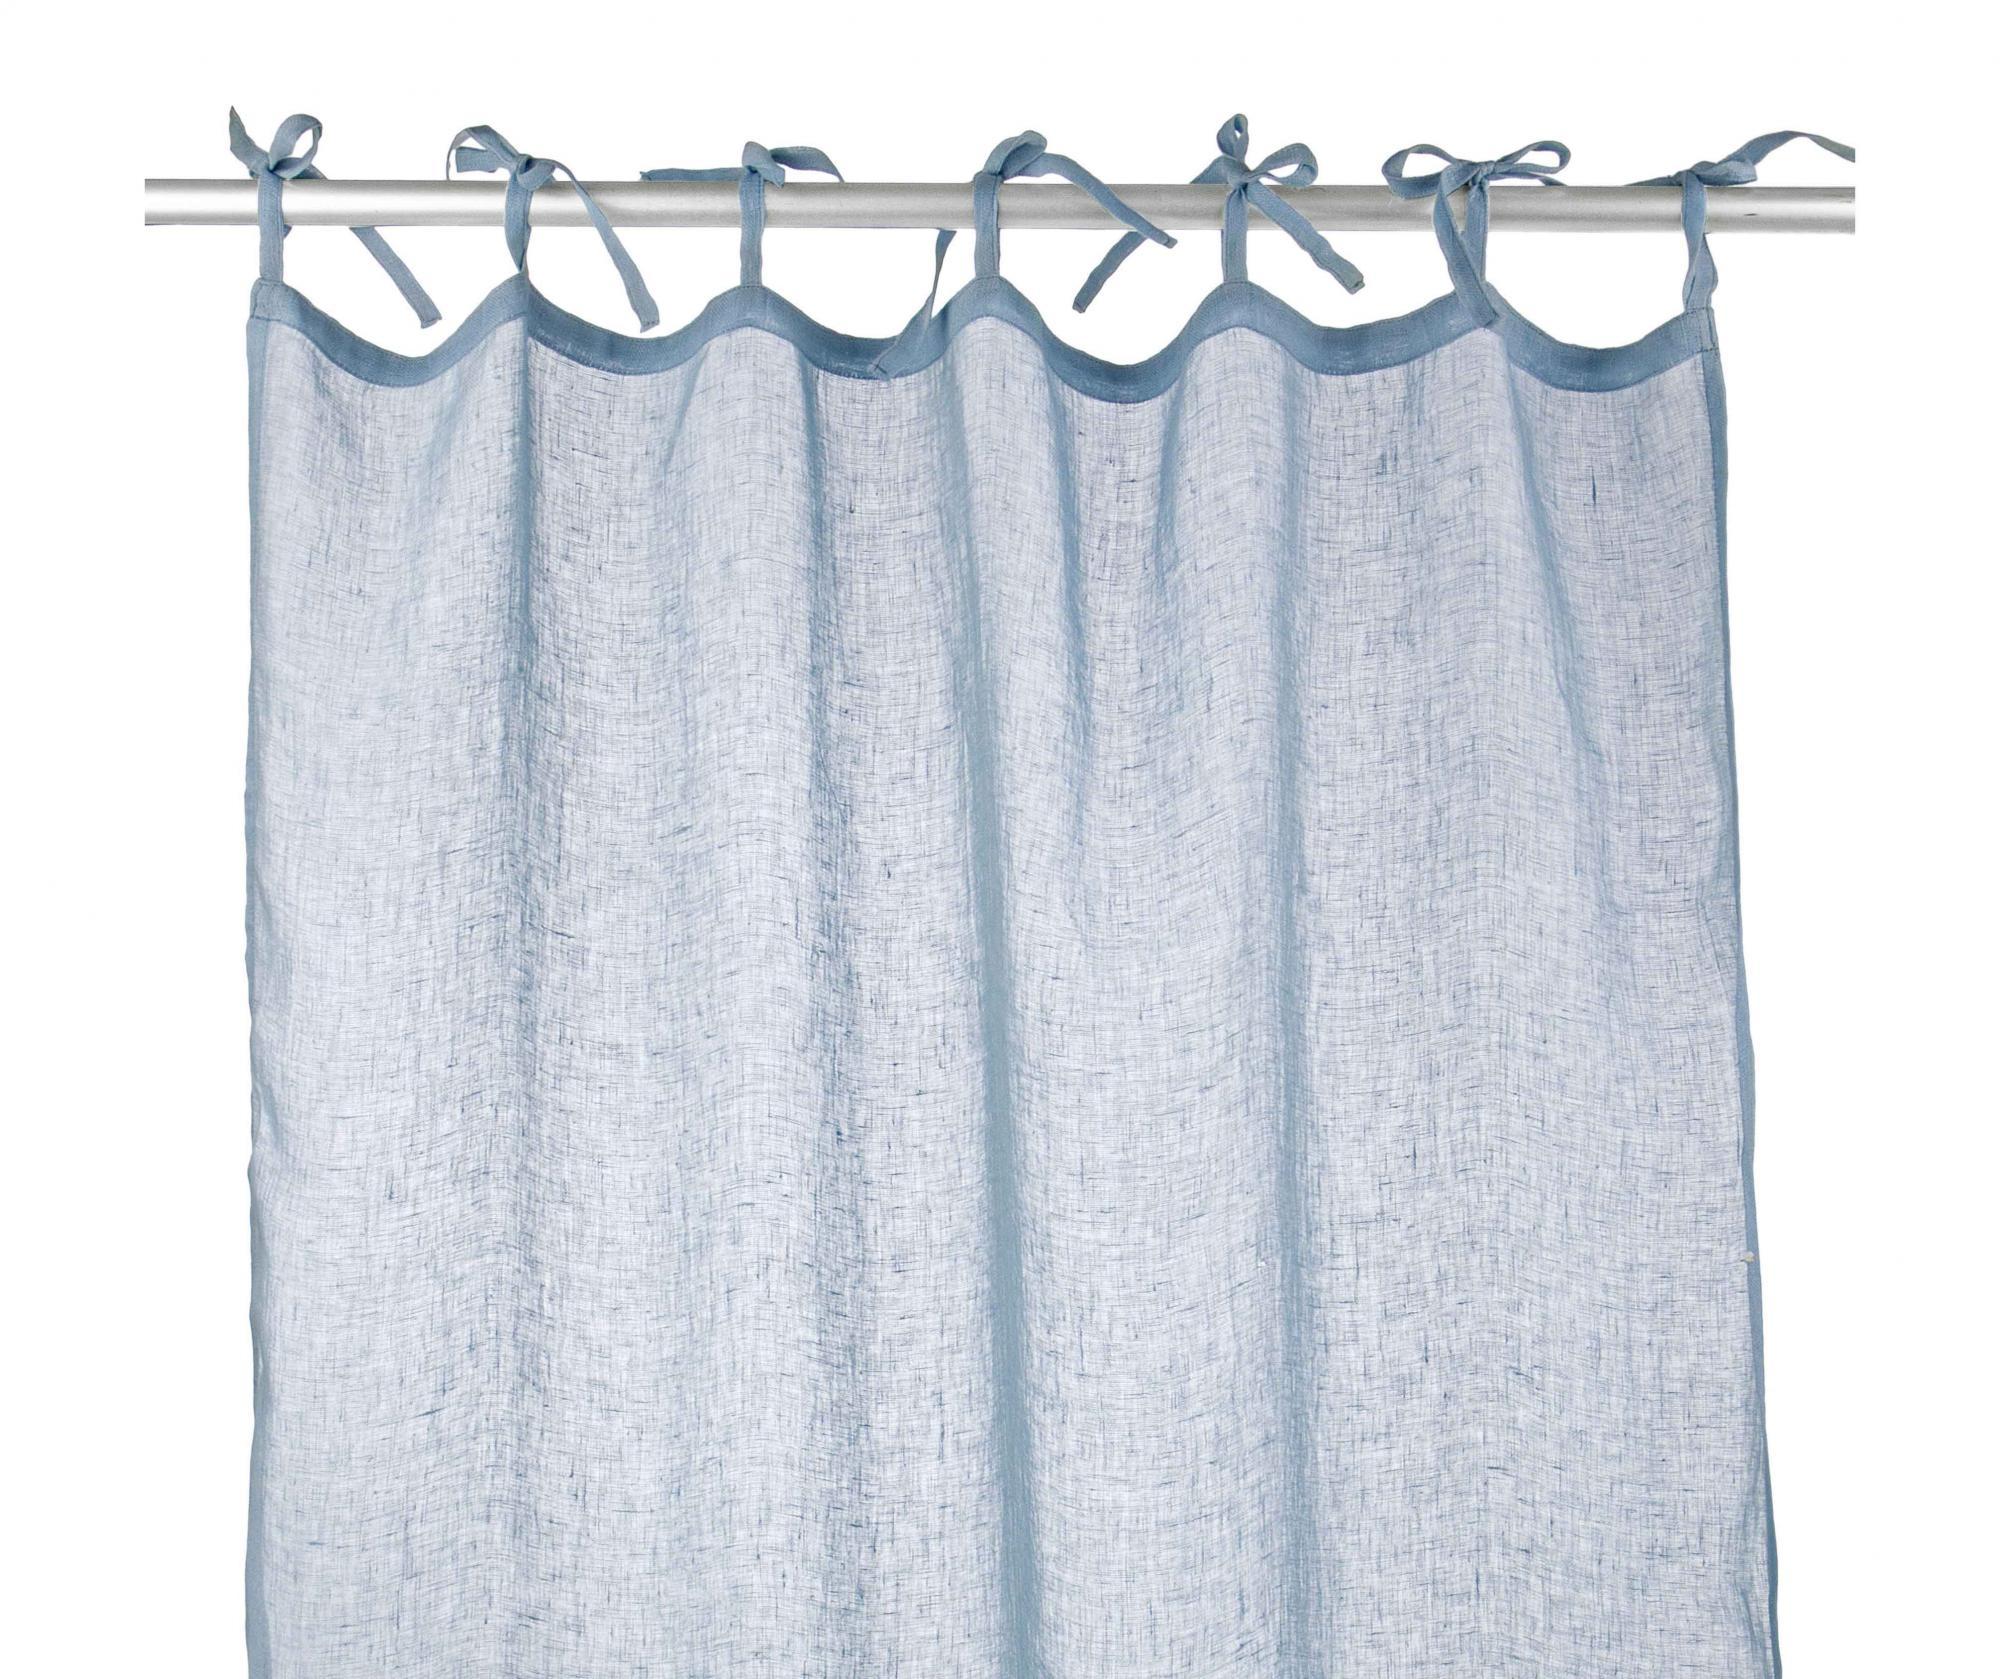 Perdea Carol Sky Blue 110x280 cm - Bizzotto, Albastru